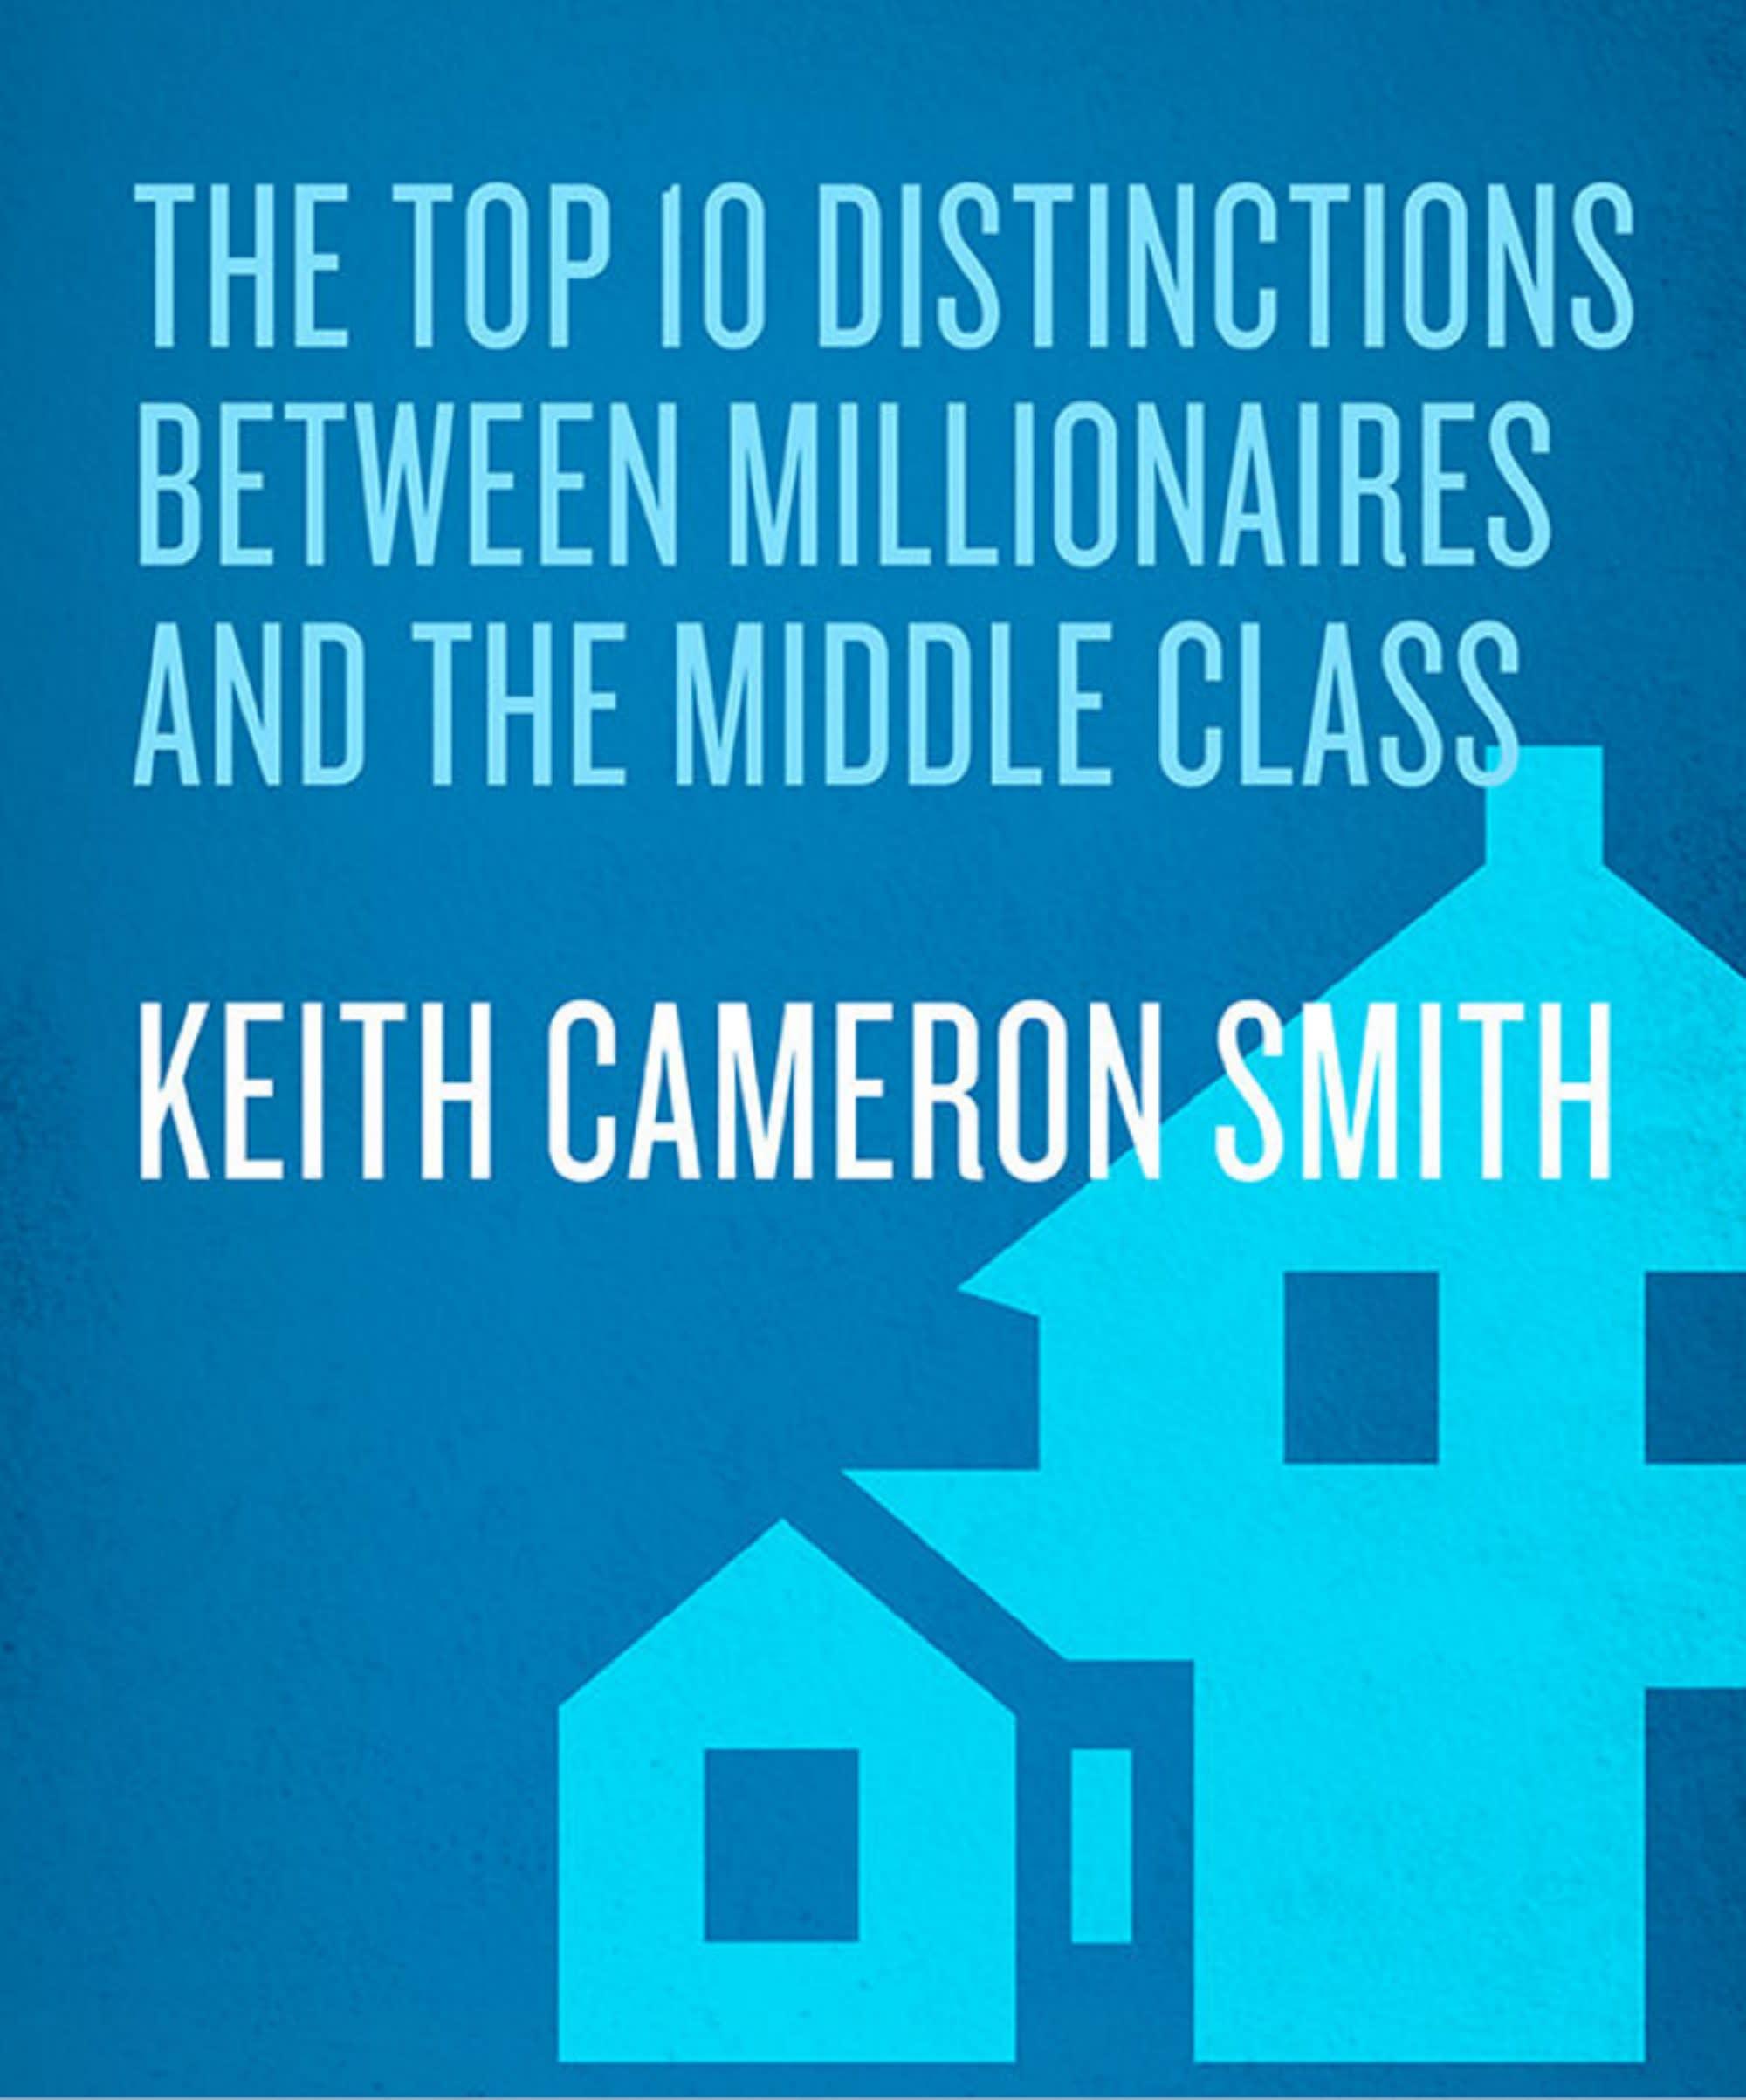 Chart asset: Keith Cameron Smith